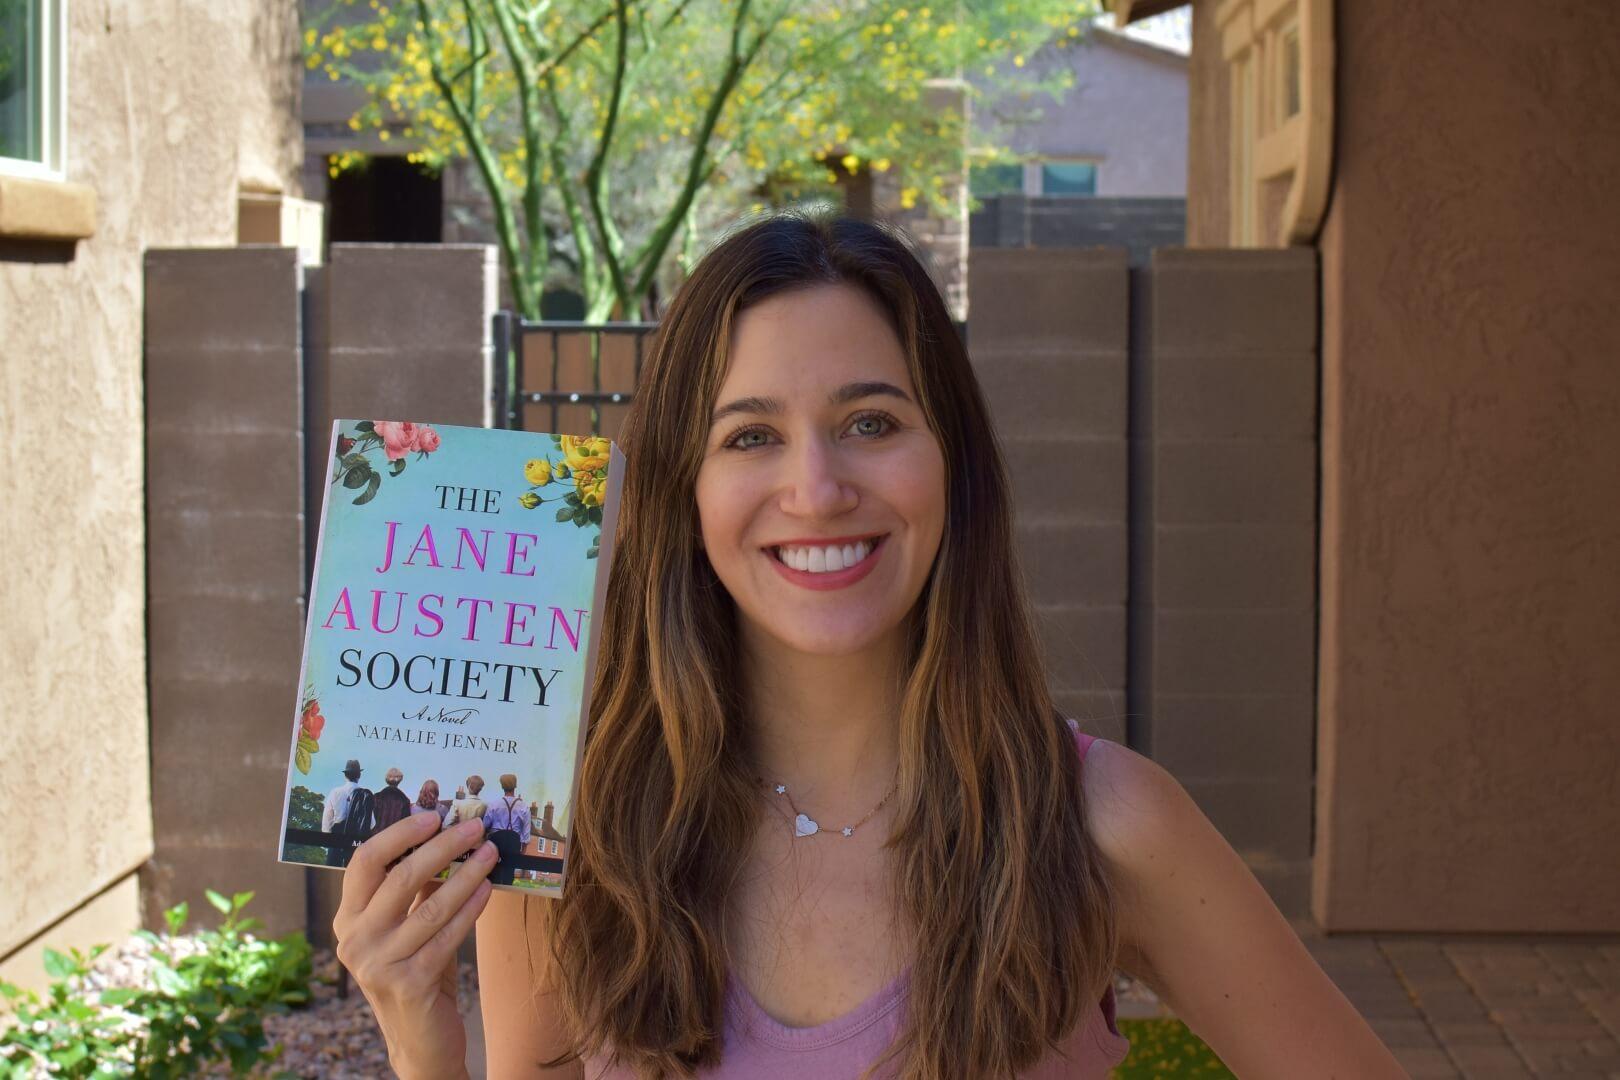 book club questions jane austen society - book club chat